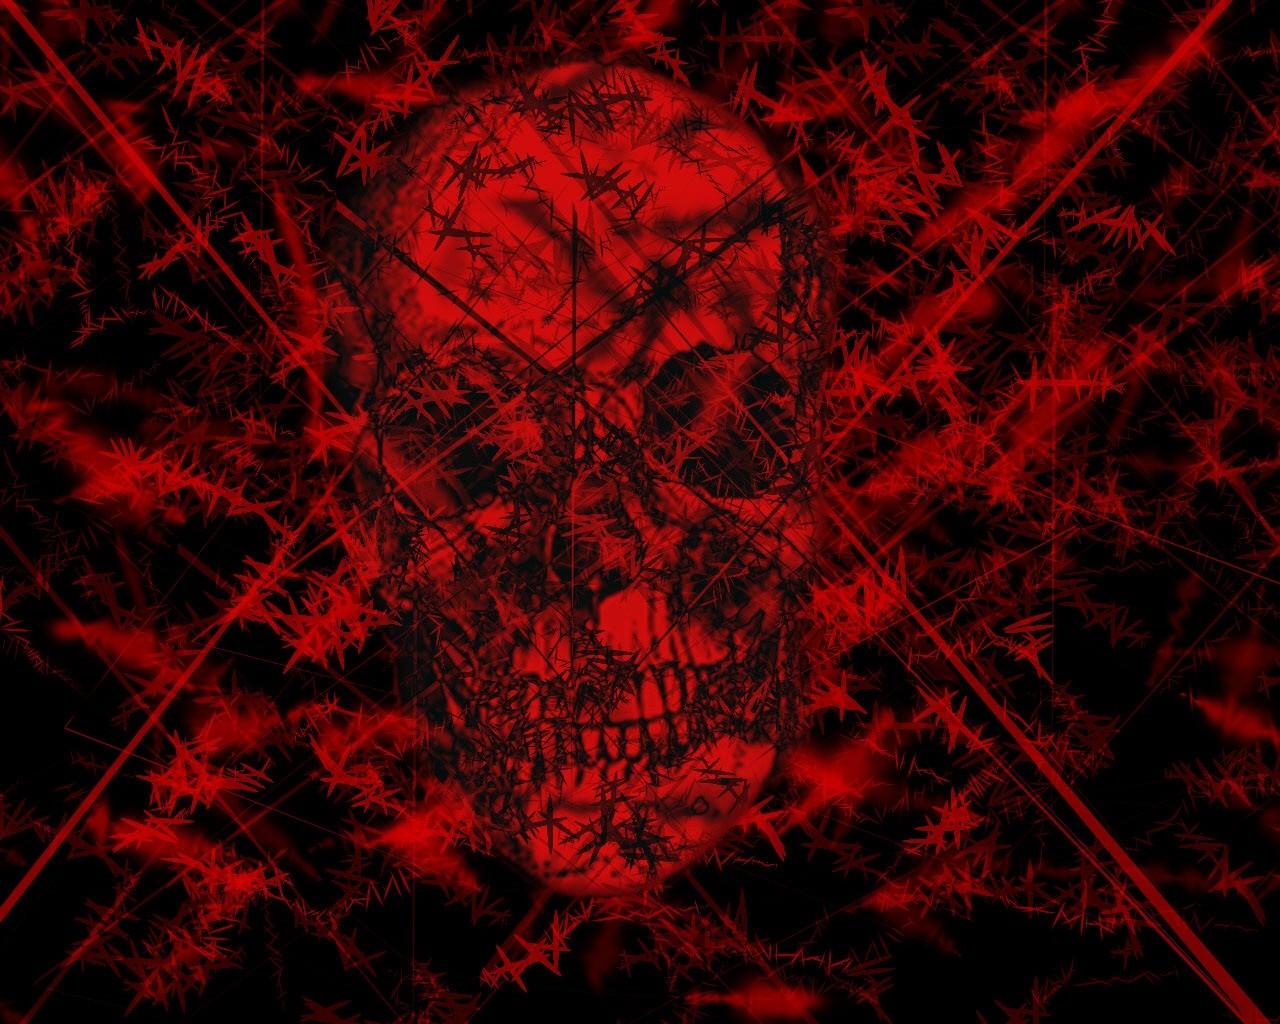 Red And Black Skull Wallpaper Sf Wallpaper